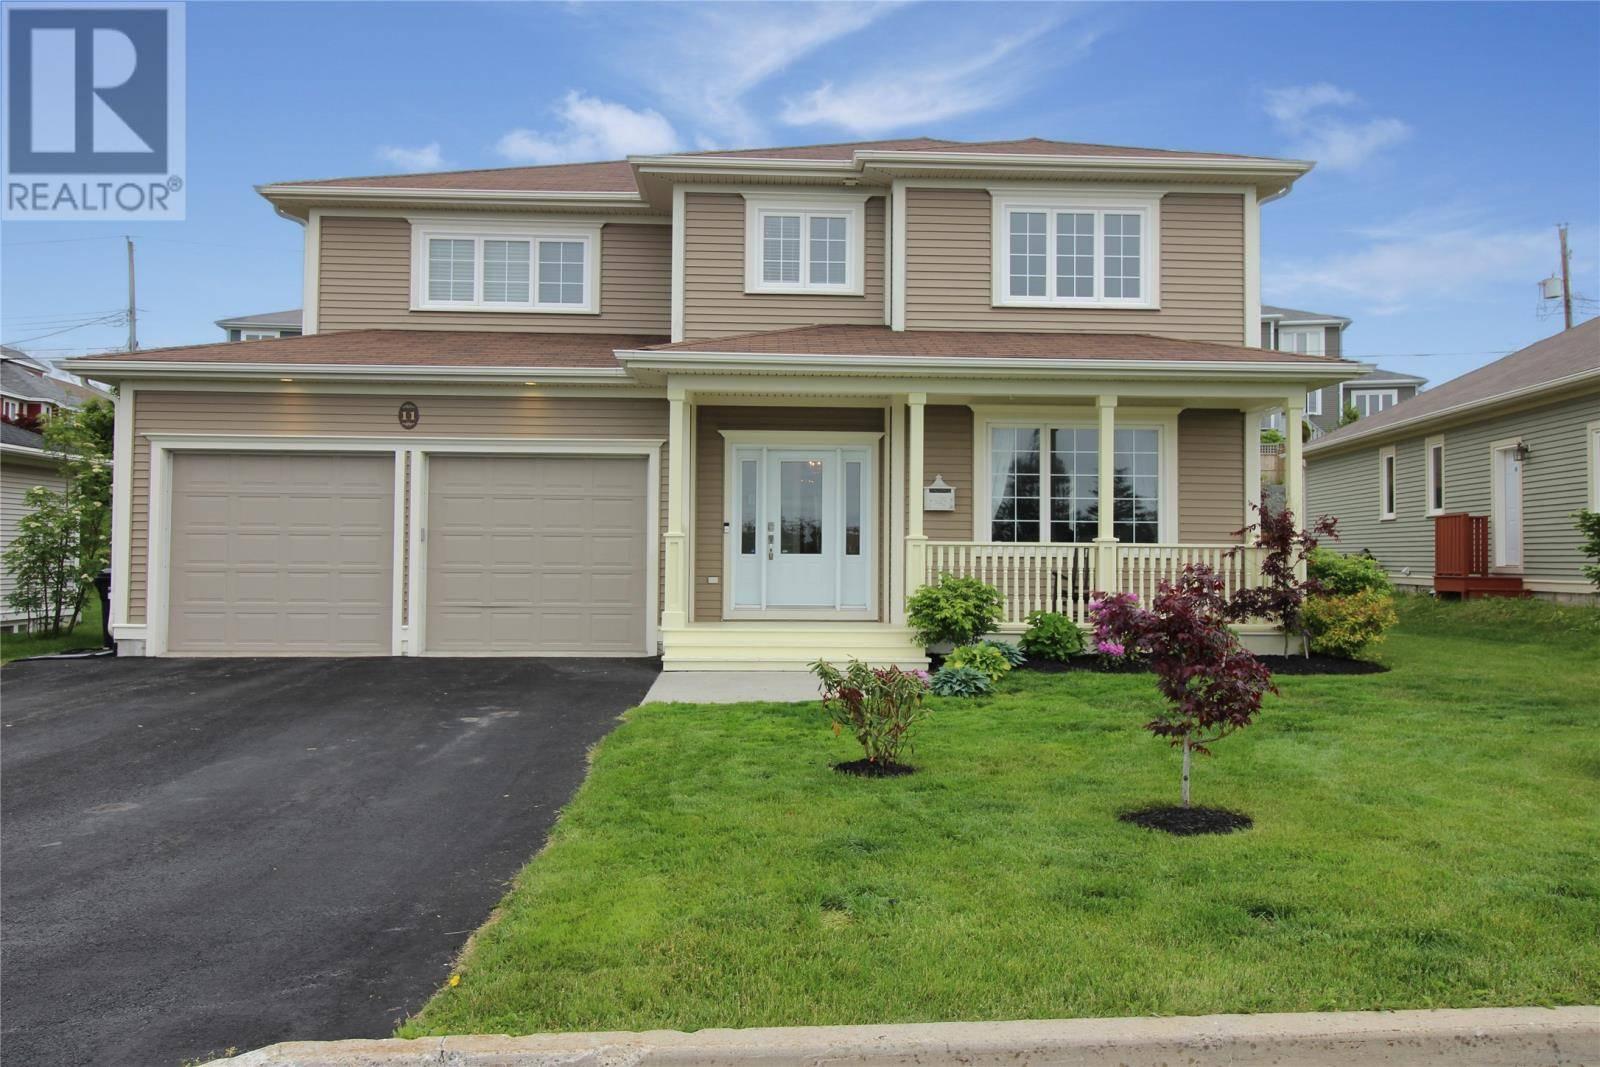 House for sale at 11 Stonebridge Pl St. John's Newfoundland - MLS: 1204551